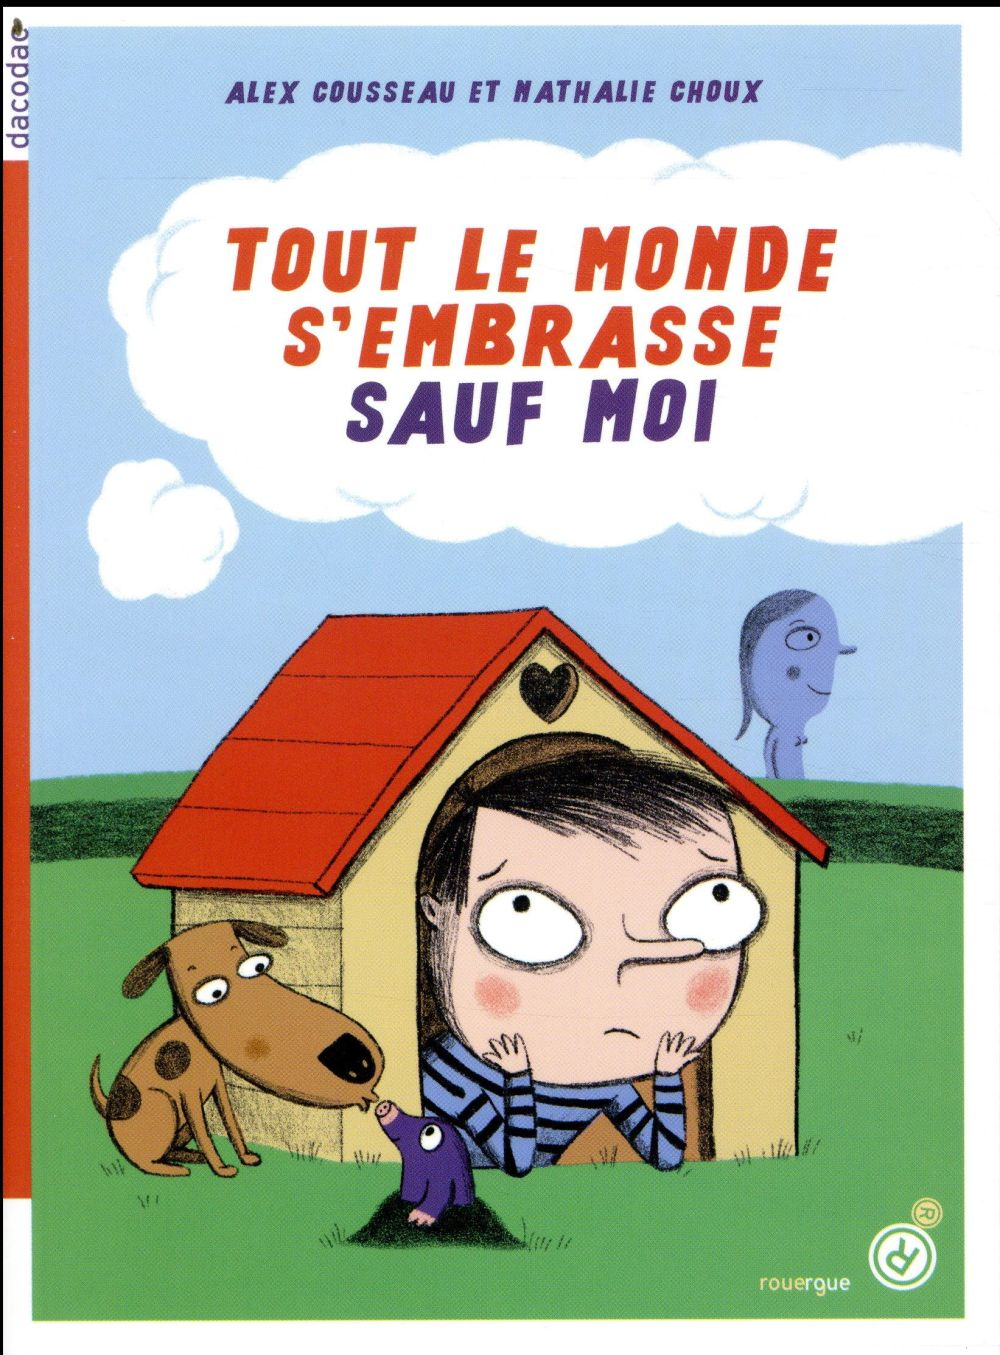 TOUT LE MONDE S-EMBRASSE SAUF MOI